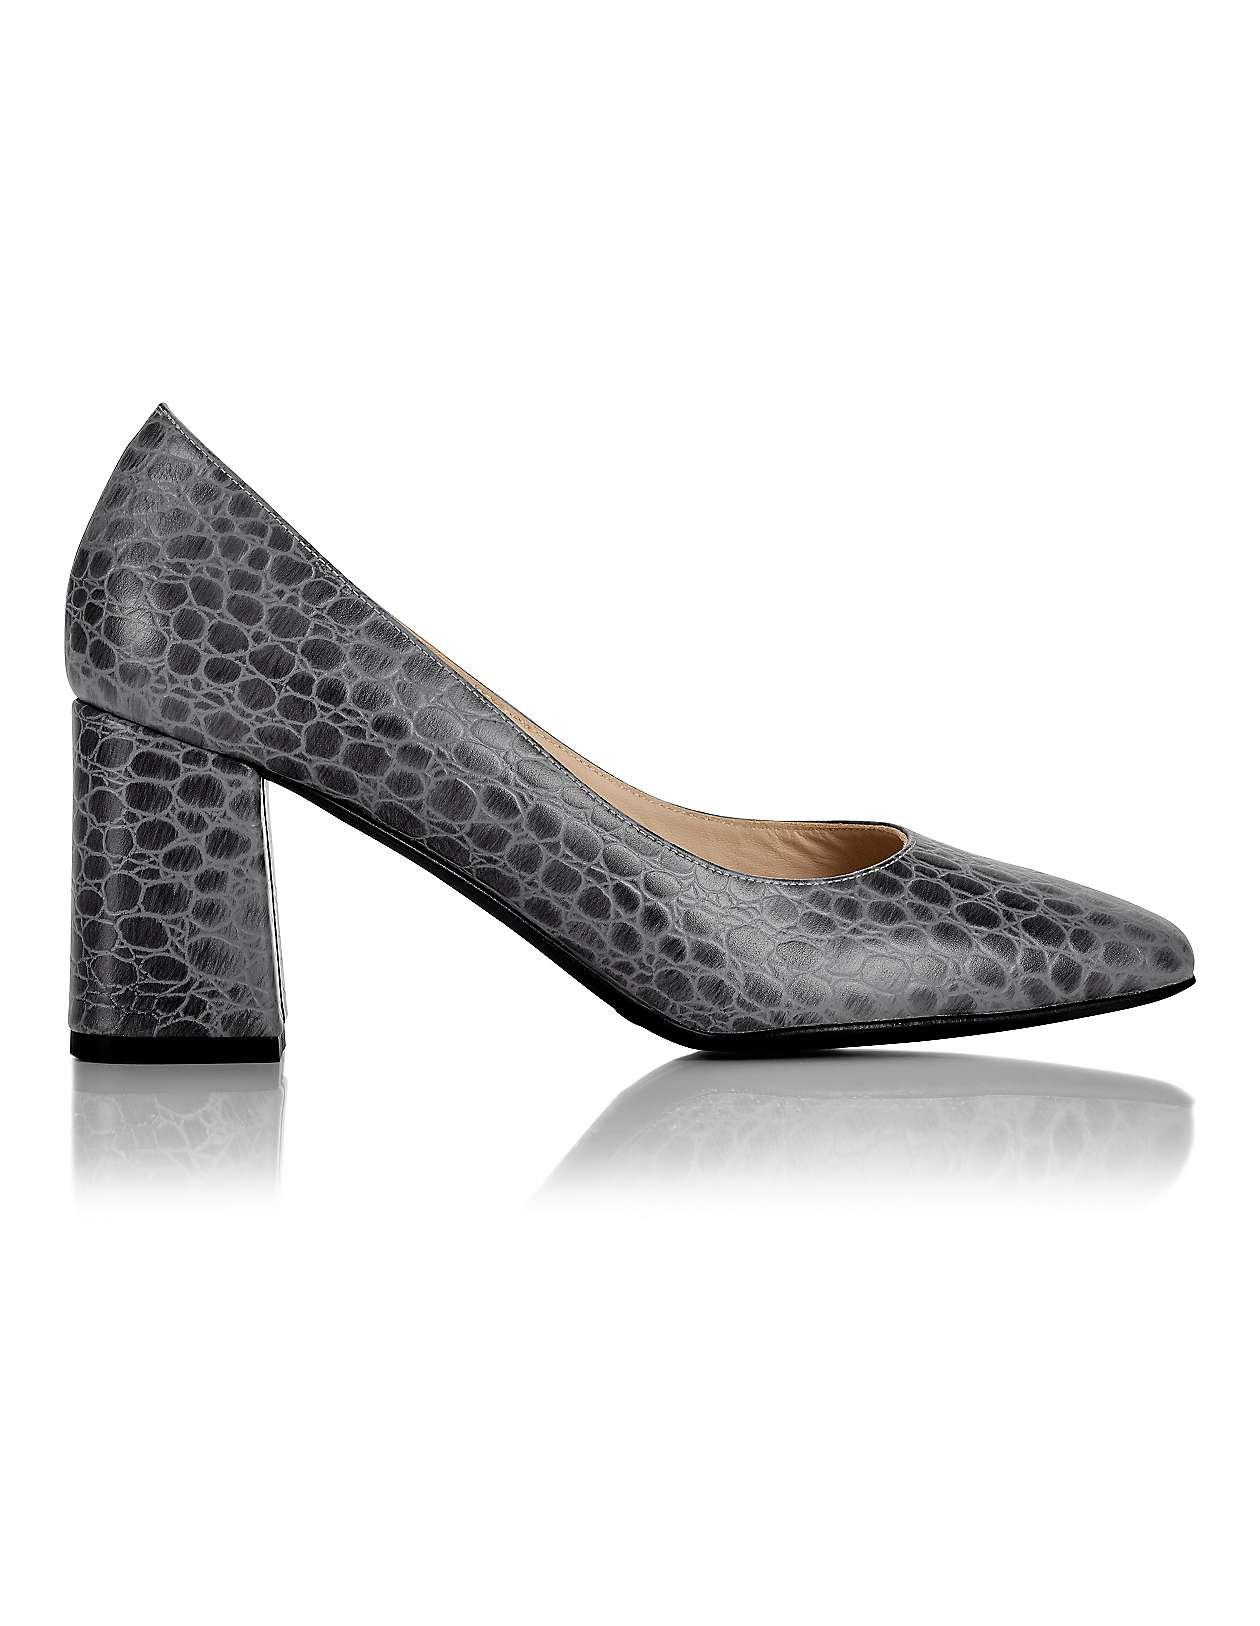 competitive price e2494 b9ec1 Schuhe | MADELEINE Mode